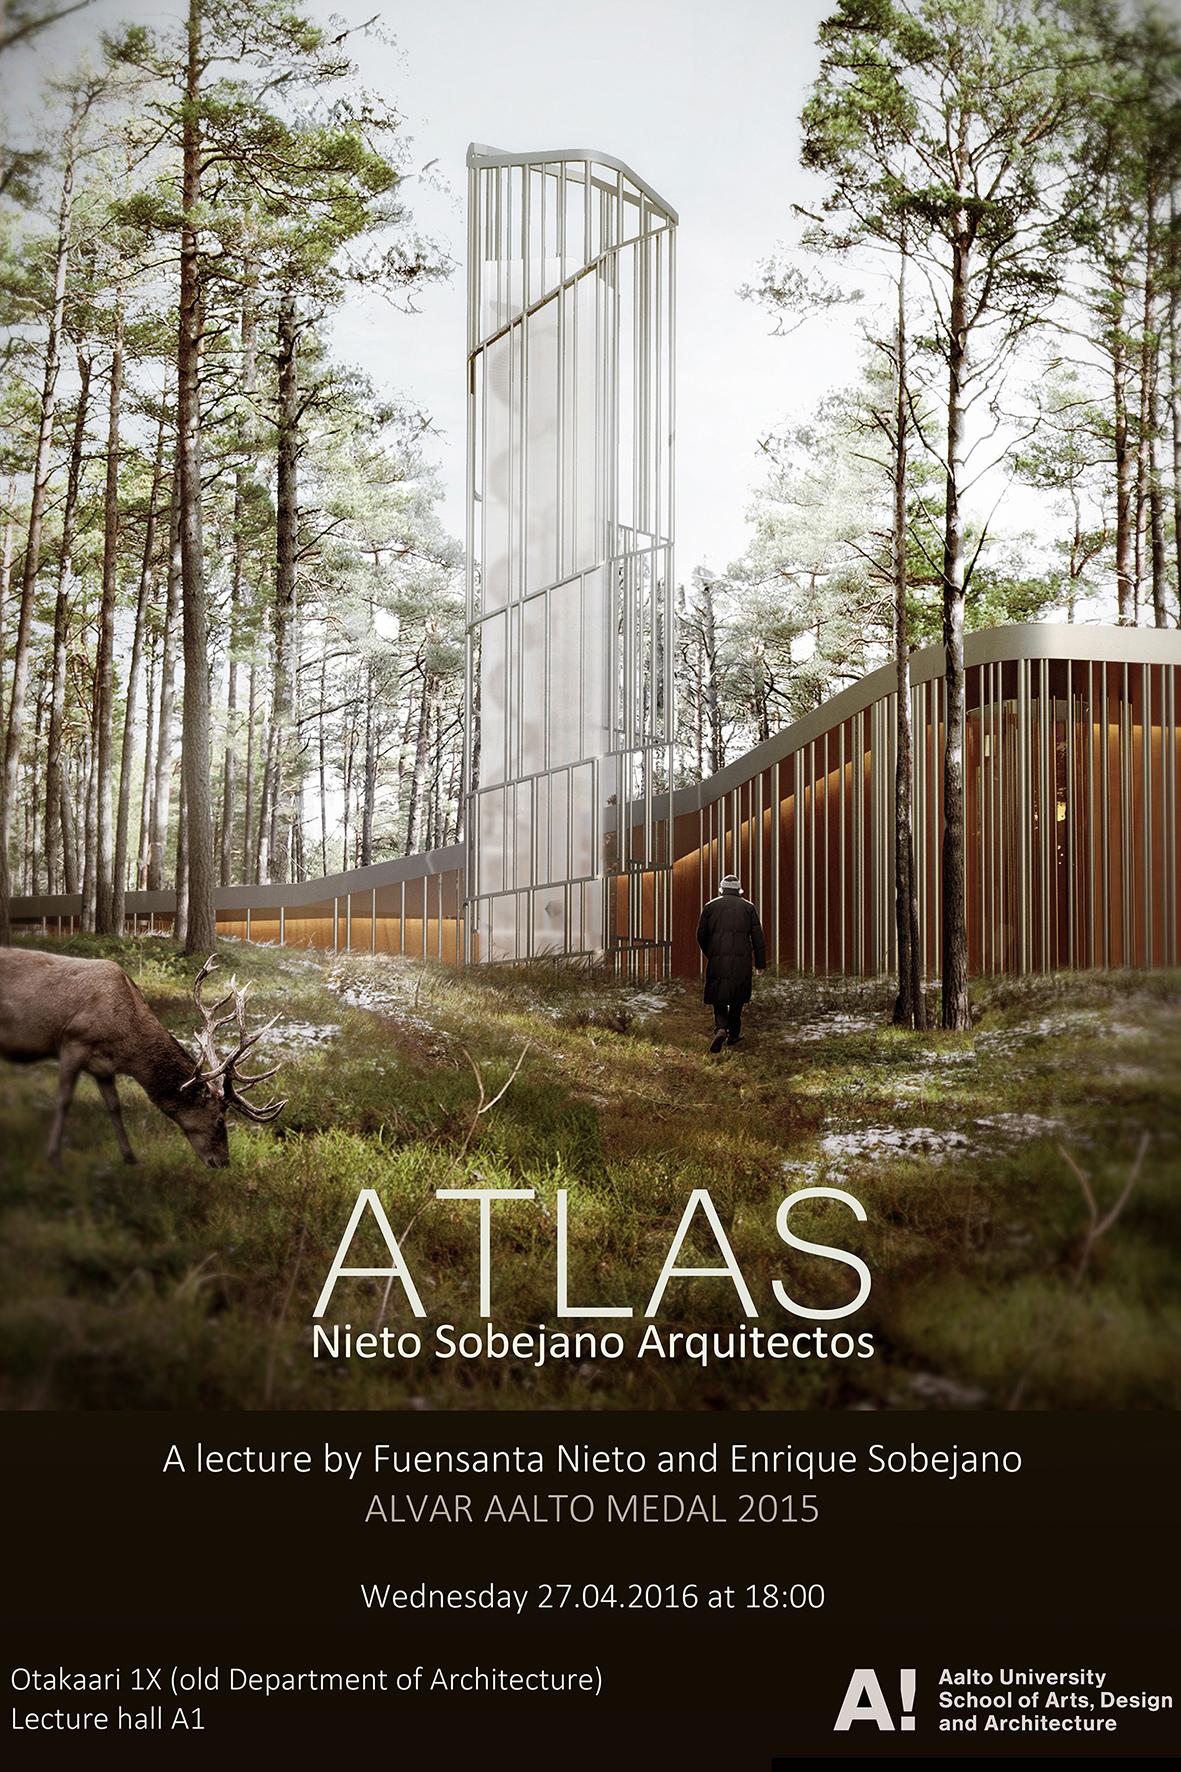 atlas_nietosobejanoarquitectos